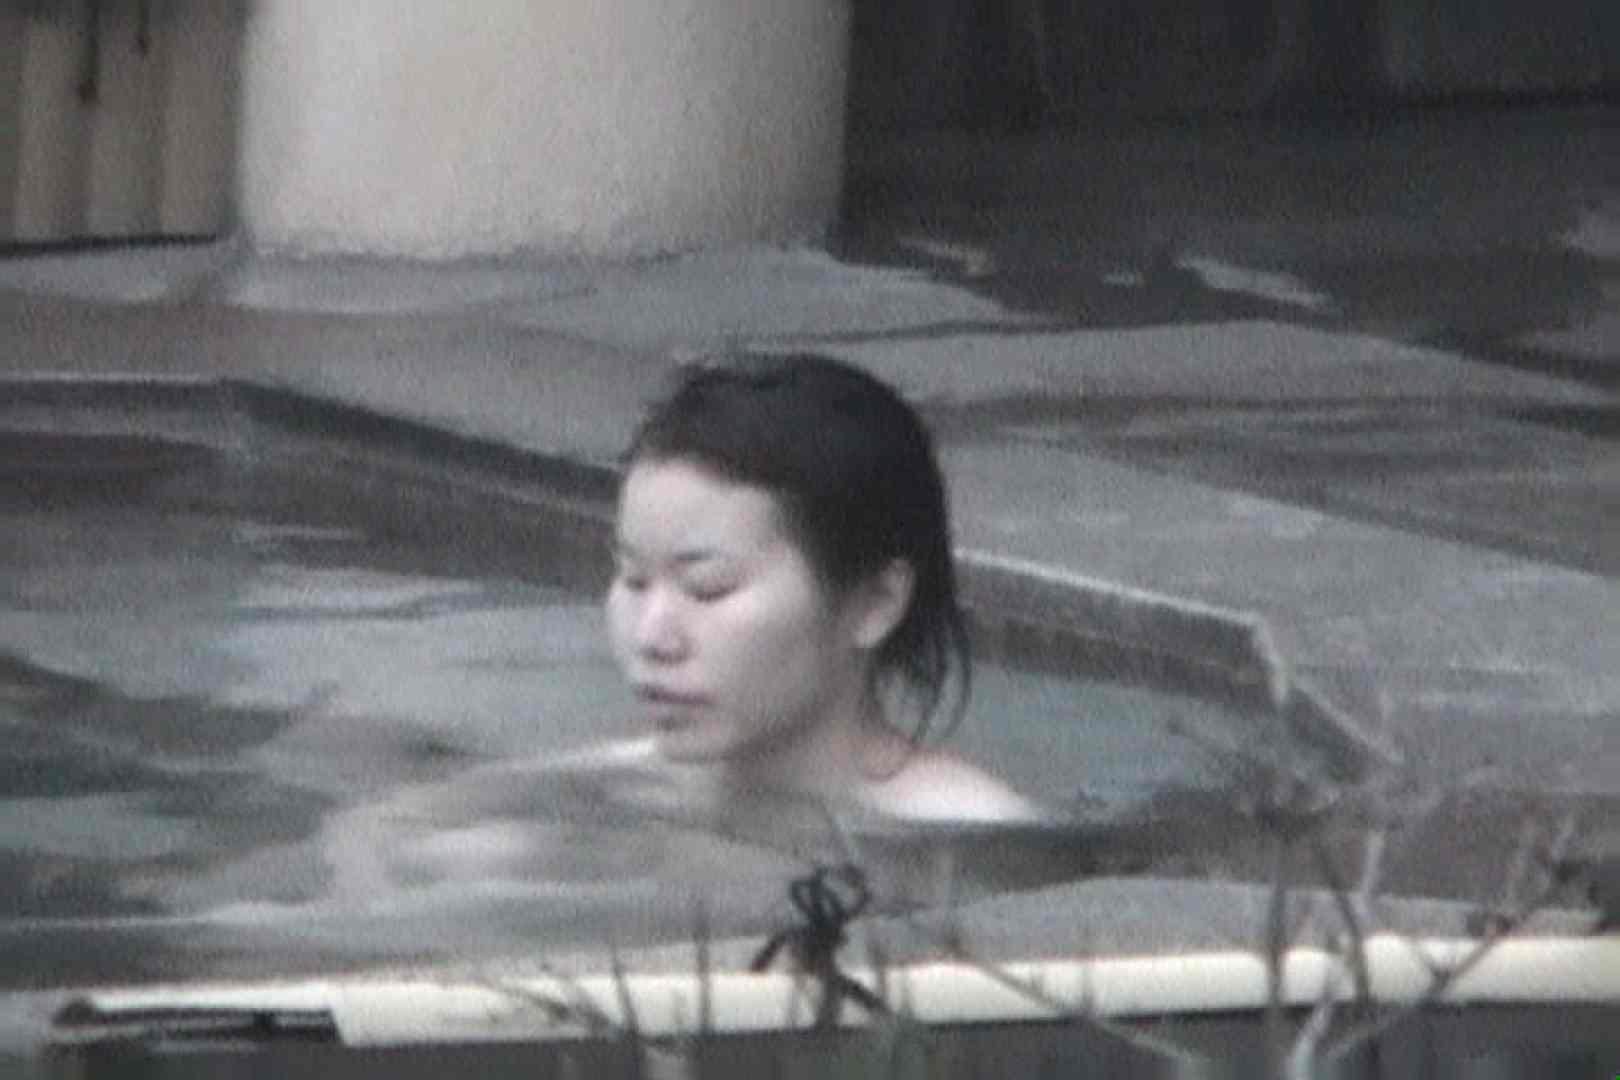 Aquaな露天風呂Vol.556 露天風呂突入 | 盗撮師作品  69pic 61